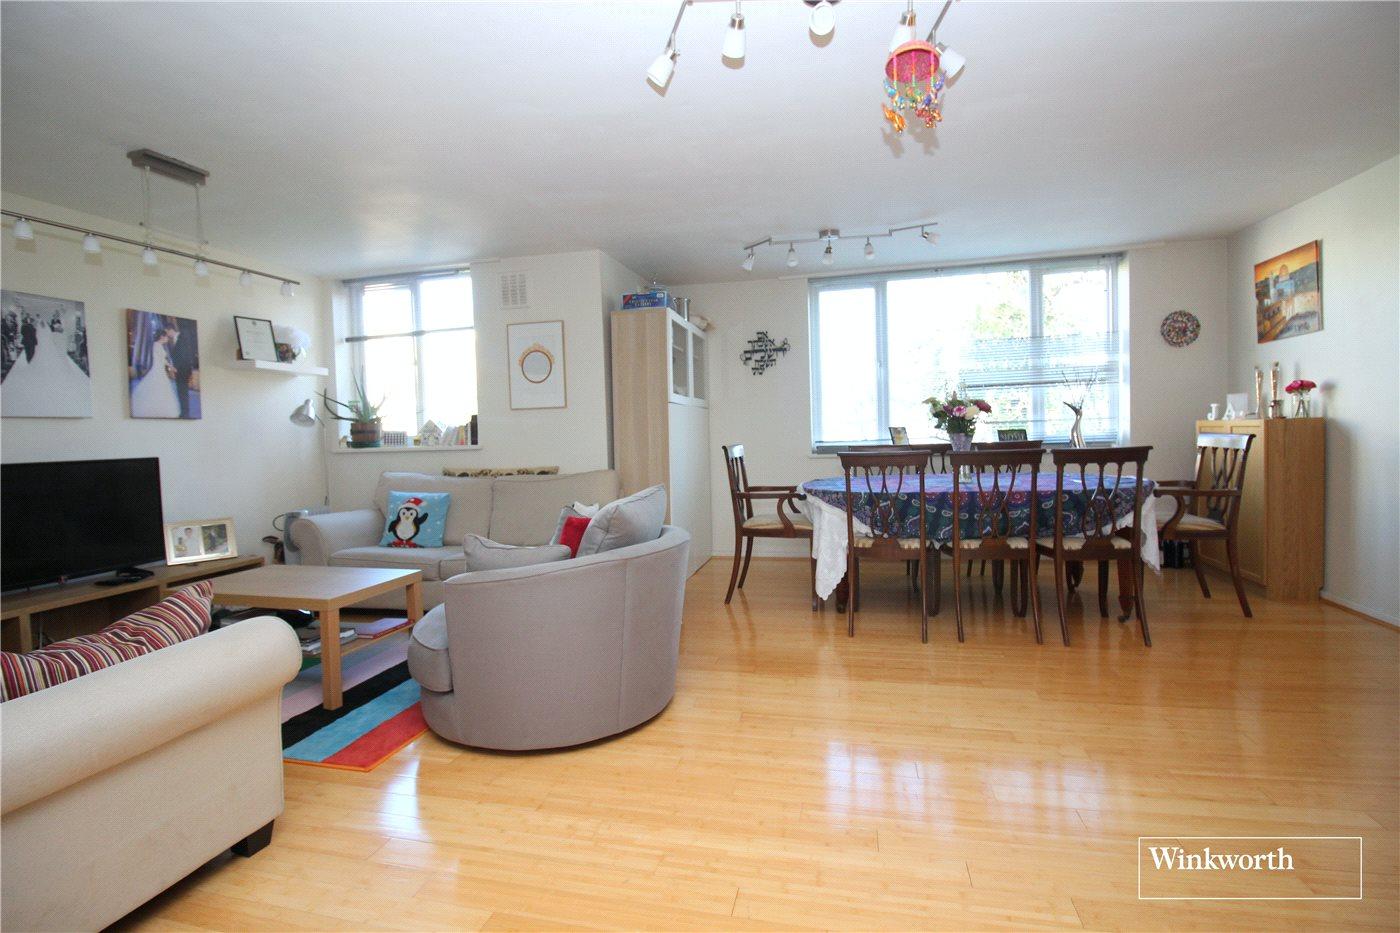 2 Bedrooms Flat for sale in Boreham Holt, Elstree, Borehamwood, Hertfordshire, WD6